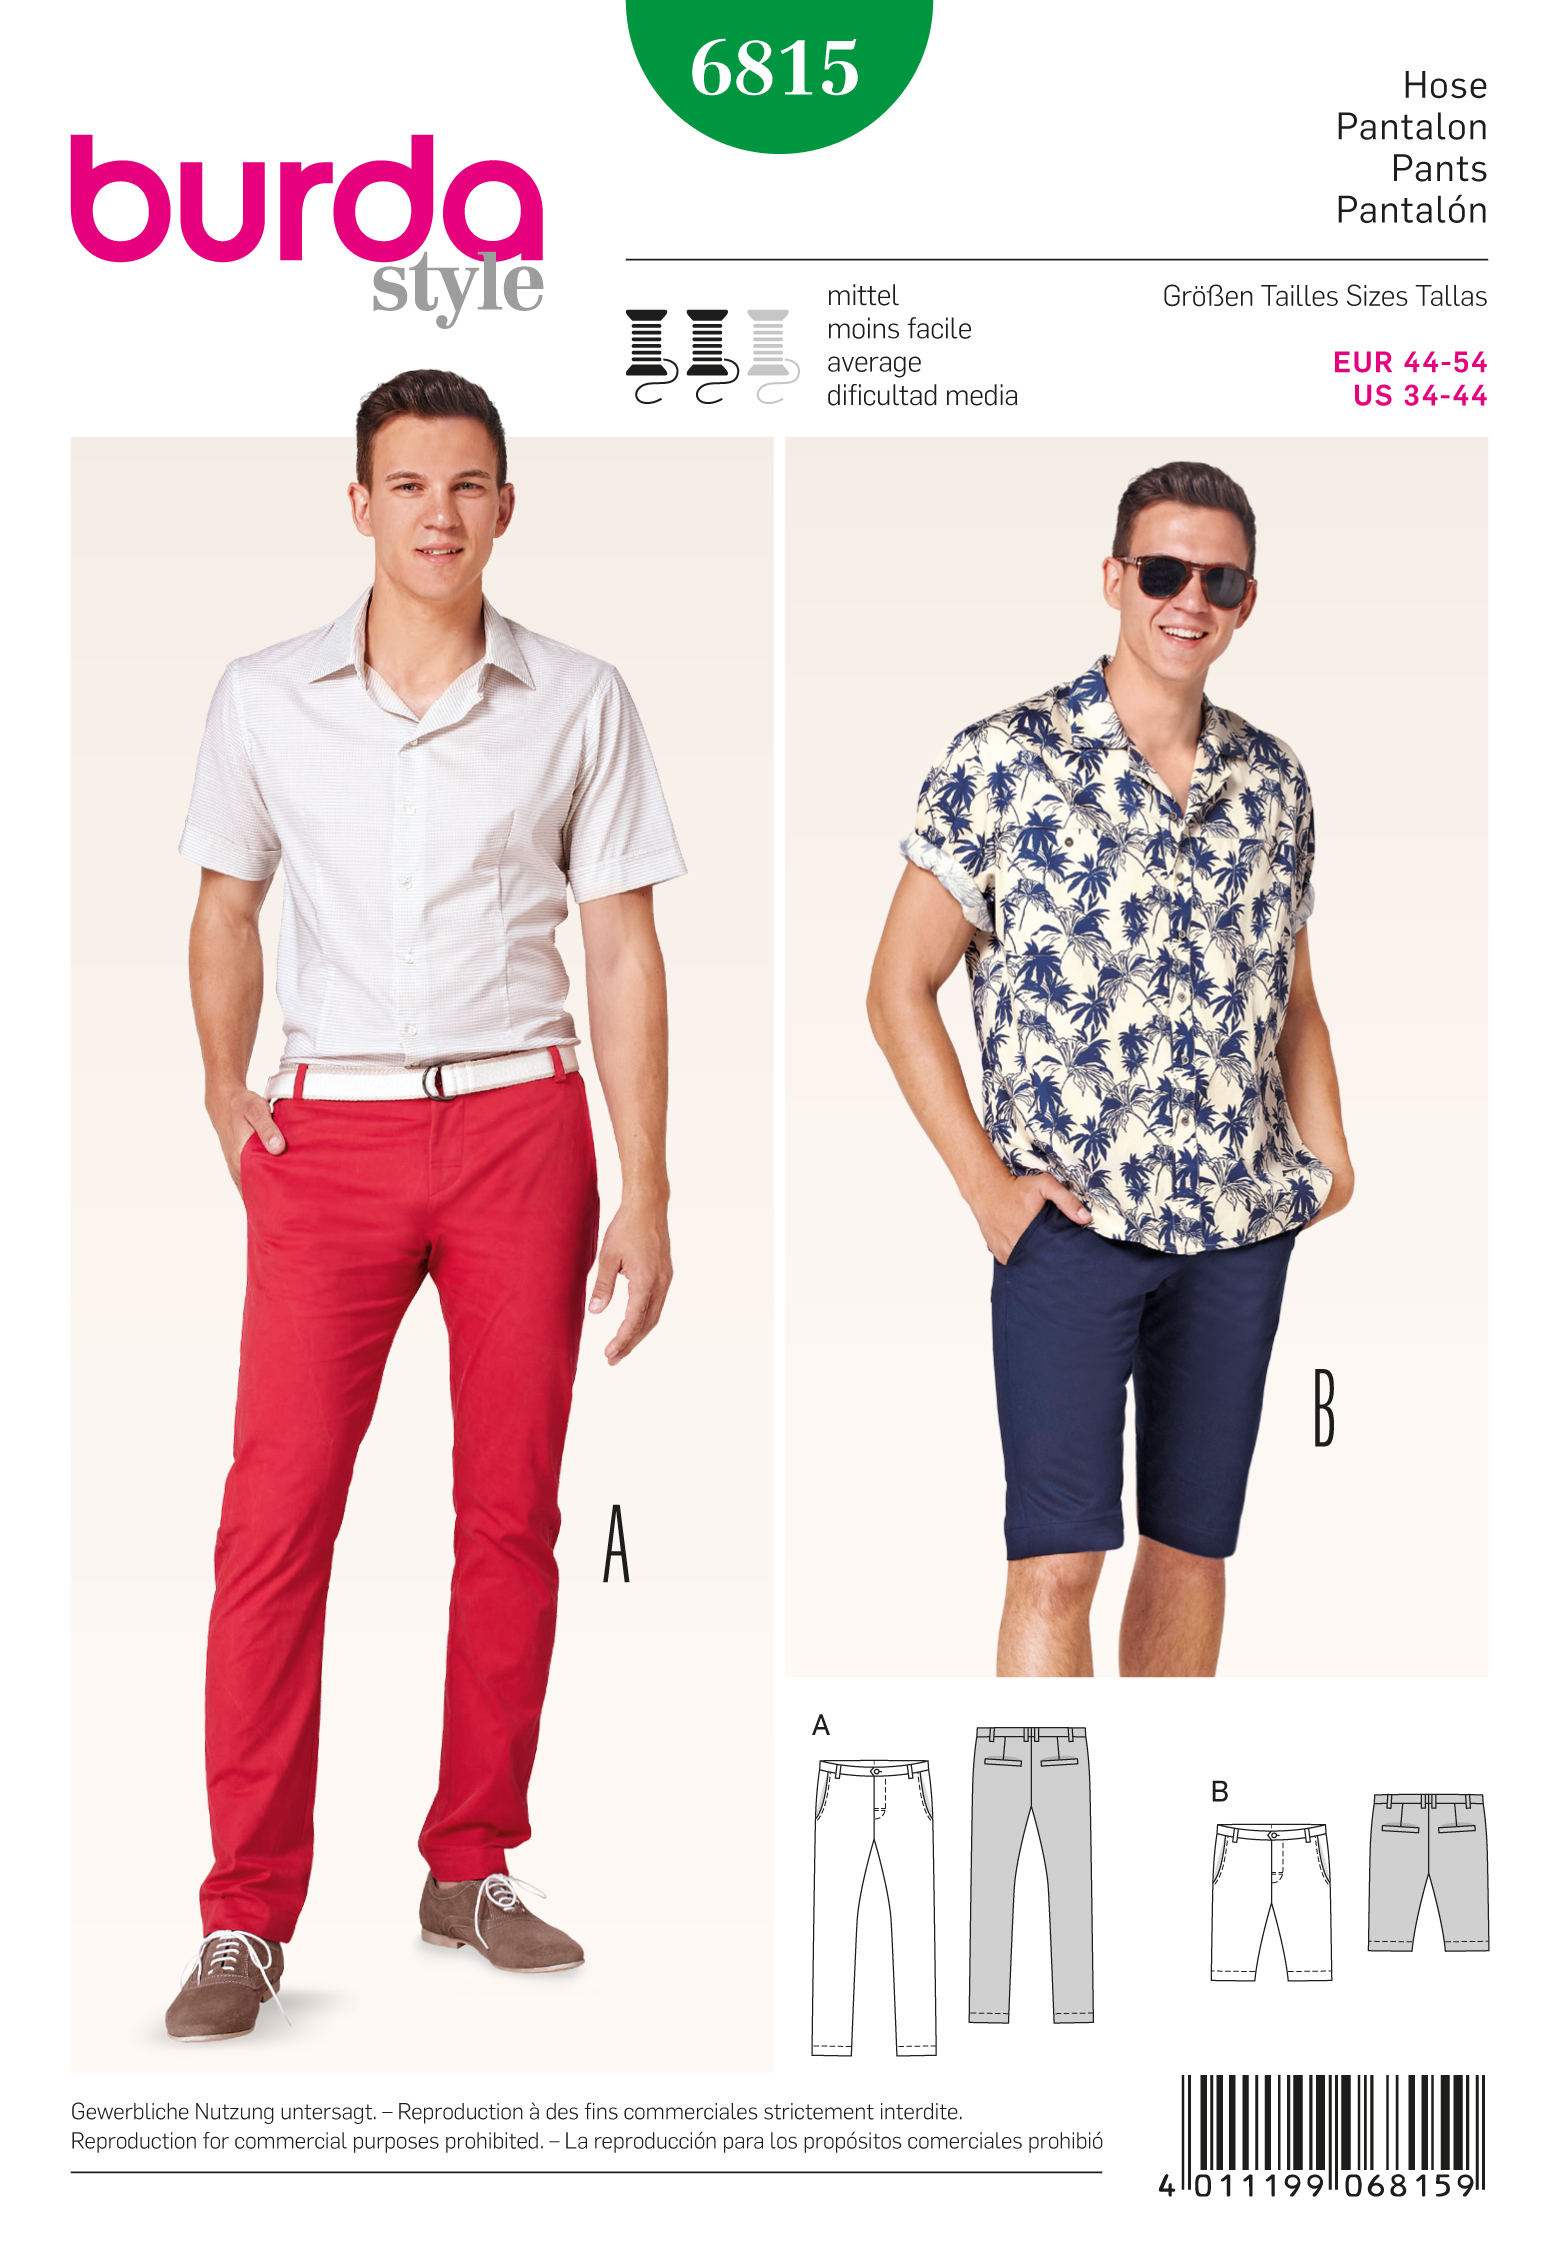 Burda 6815 Burda Style Menswear, Sportswear